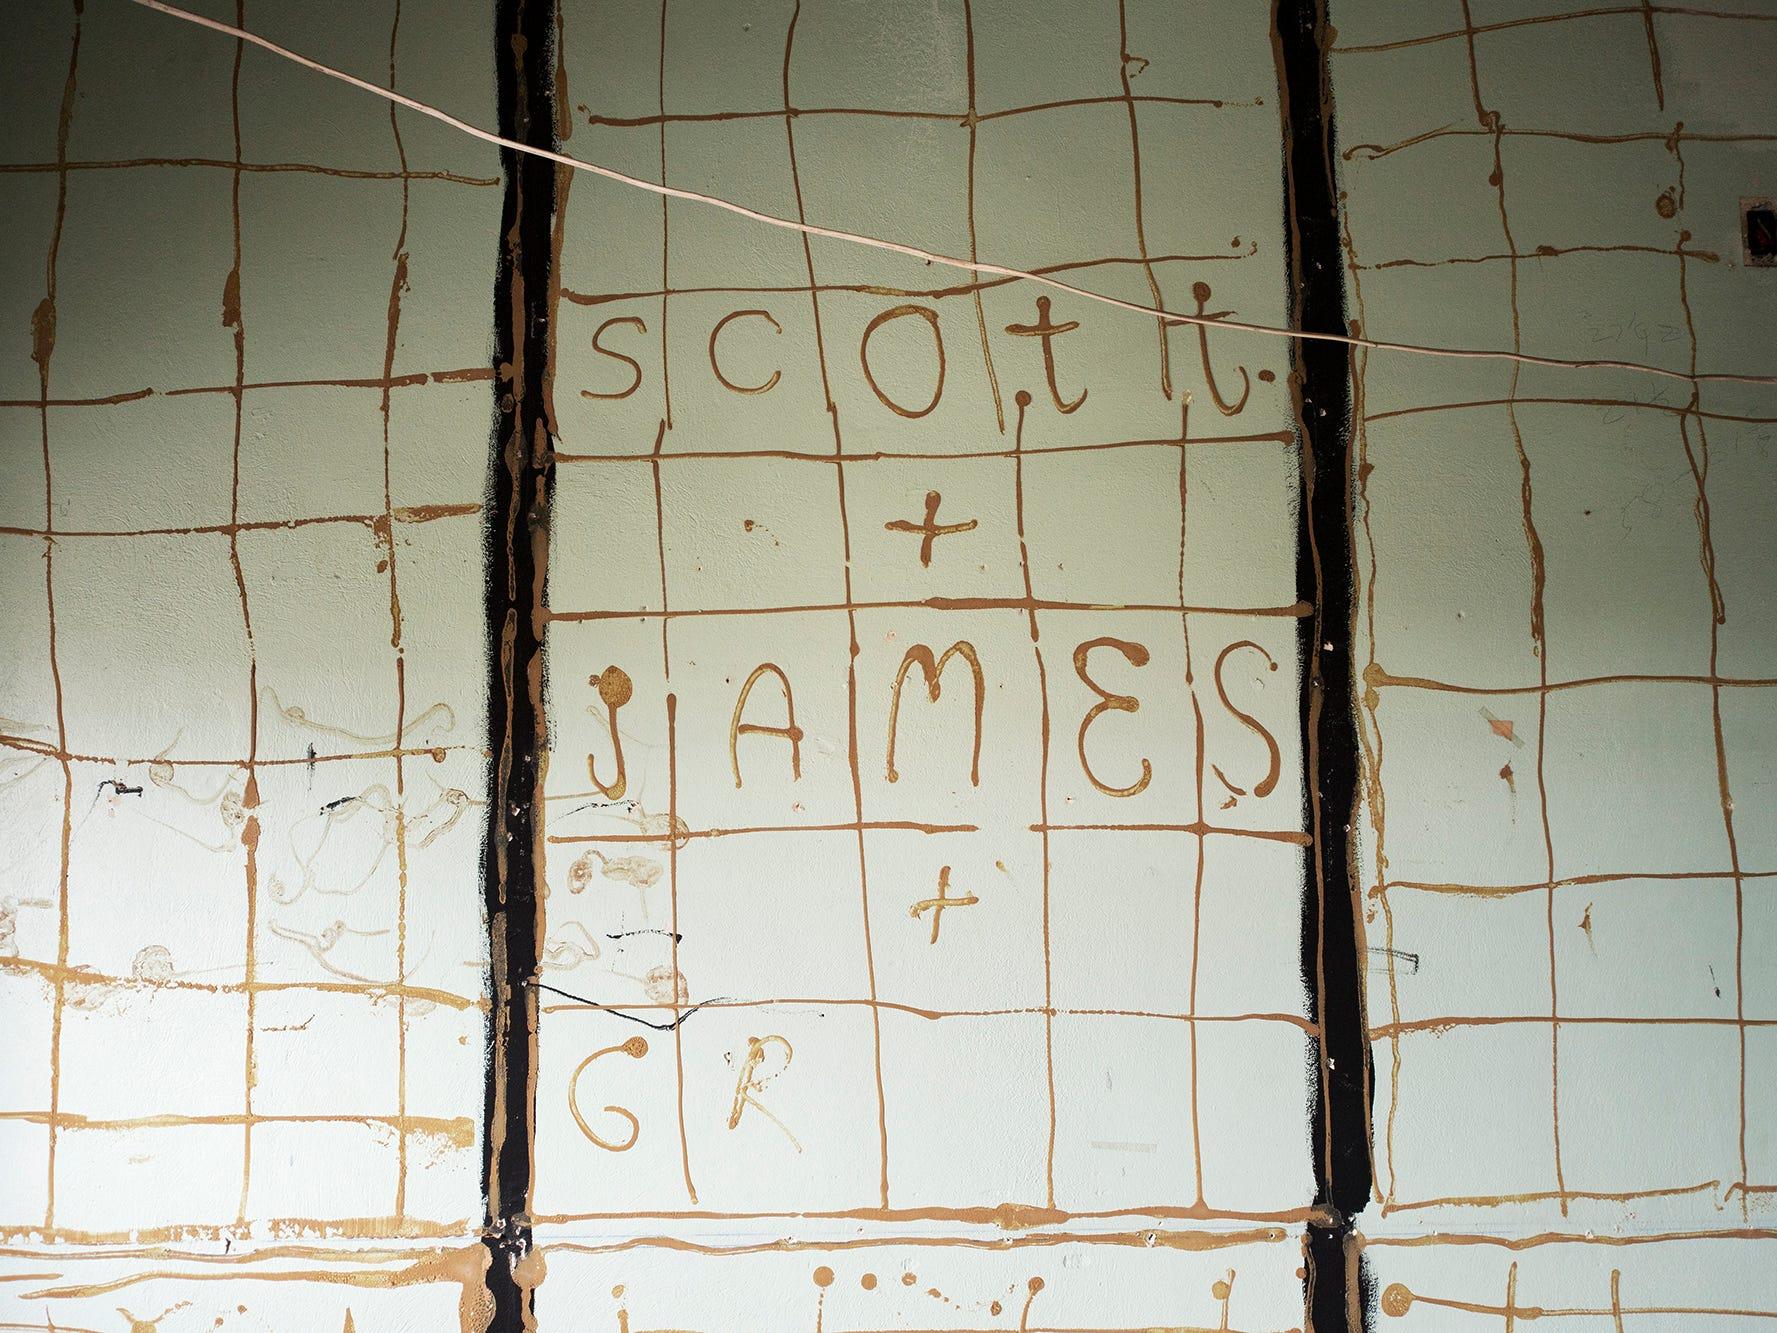 Names written in panelling glue were hidden beneath panelling at Rupp-Schmidt Building.